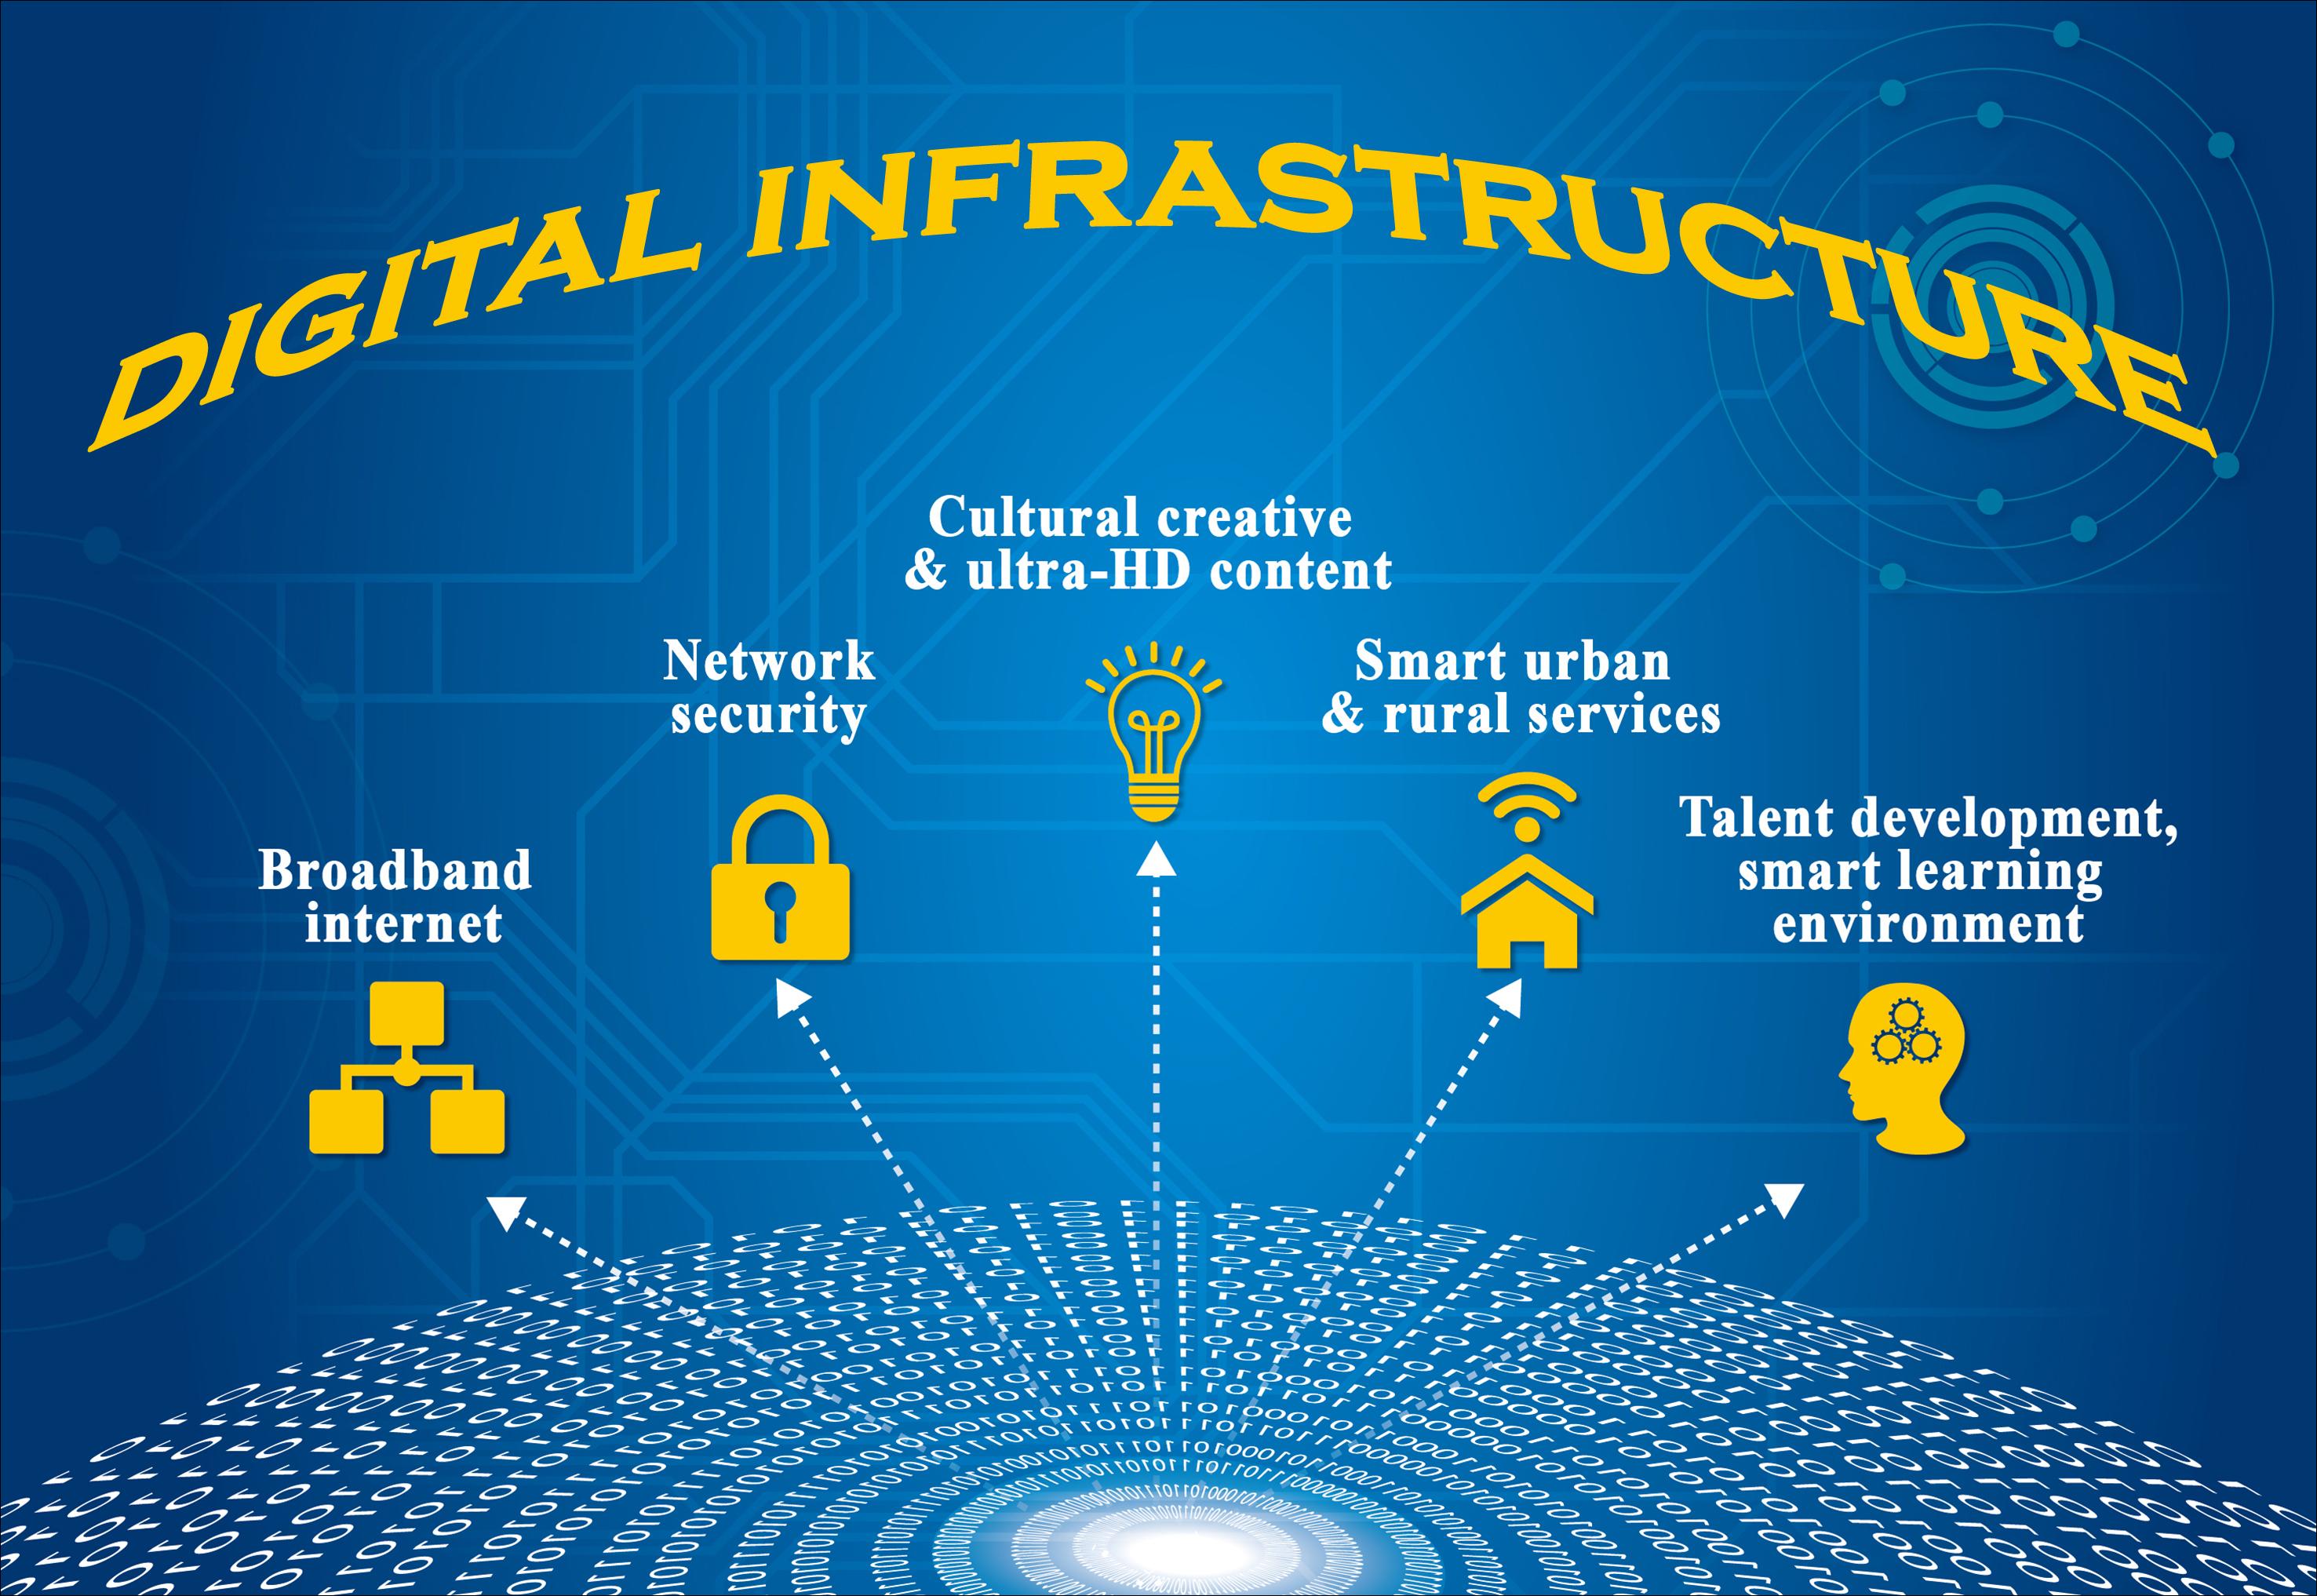 Digital_infrastructure.jpg